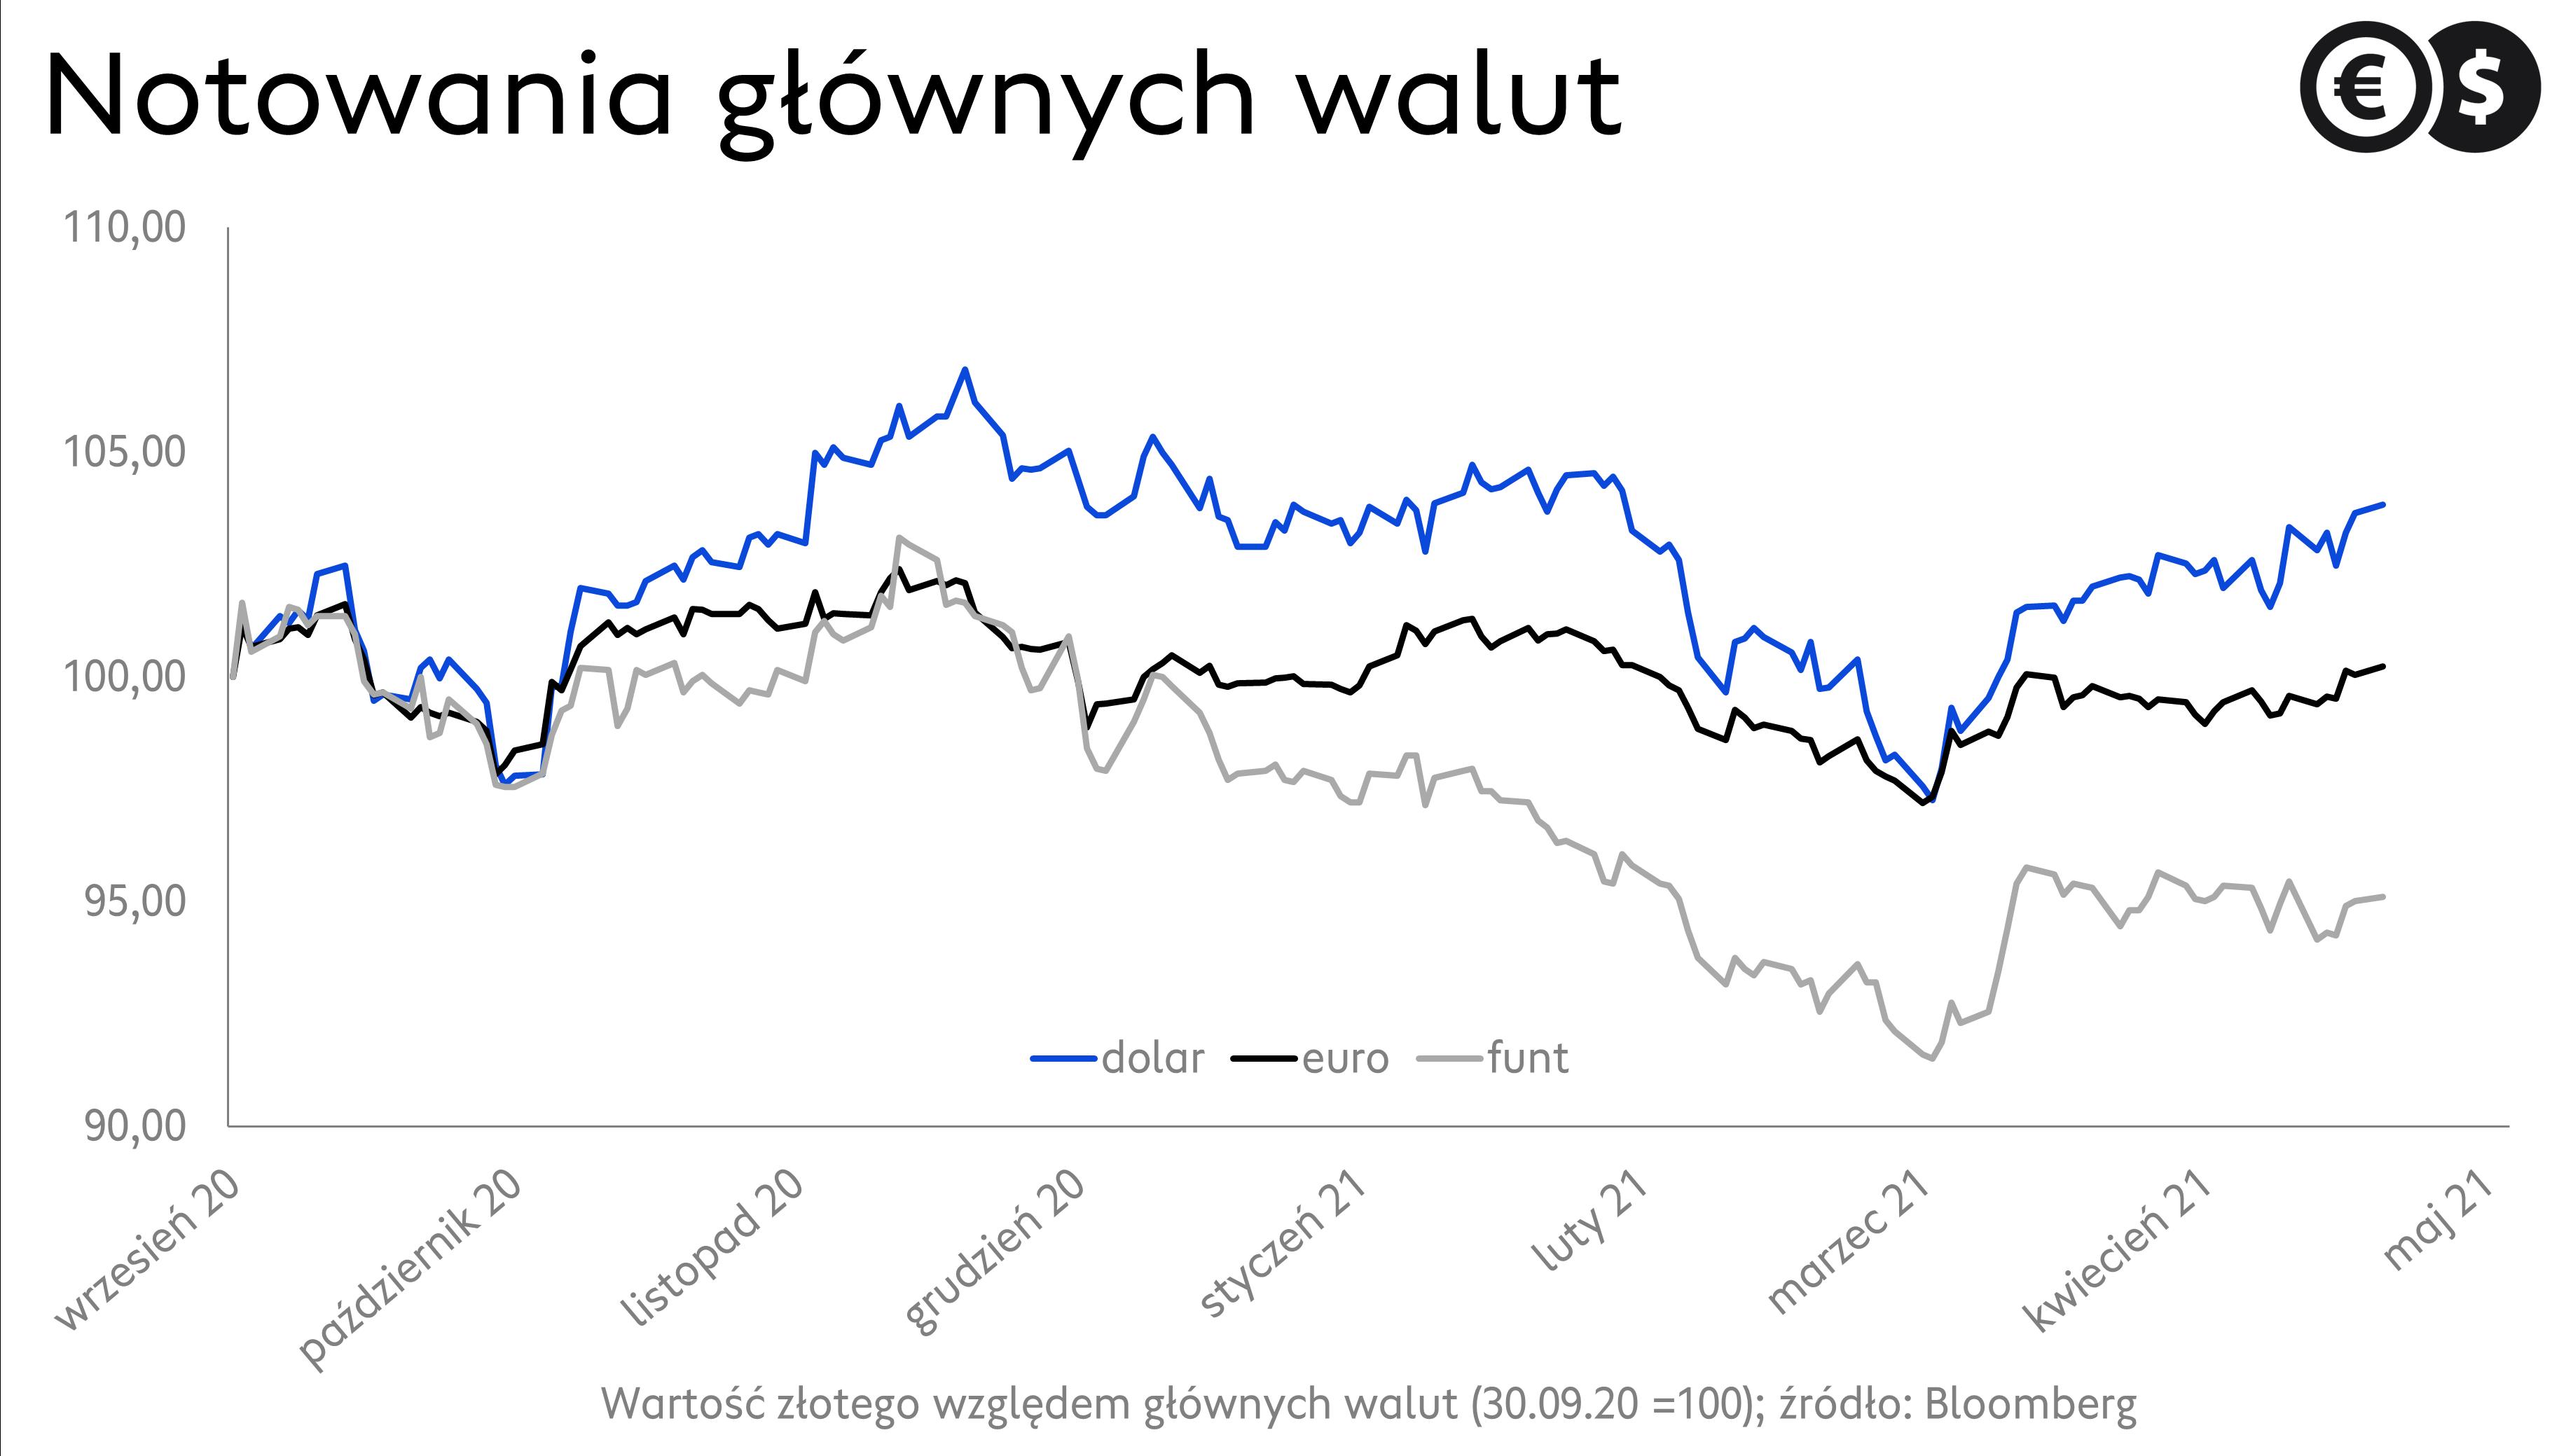 Kursy walut, wykres EUR/PLN, USD/PLN i GBP/PLN.